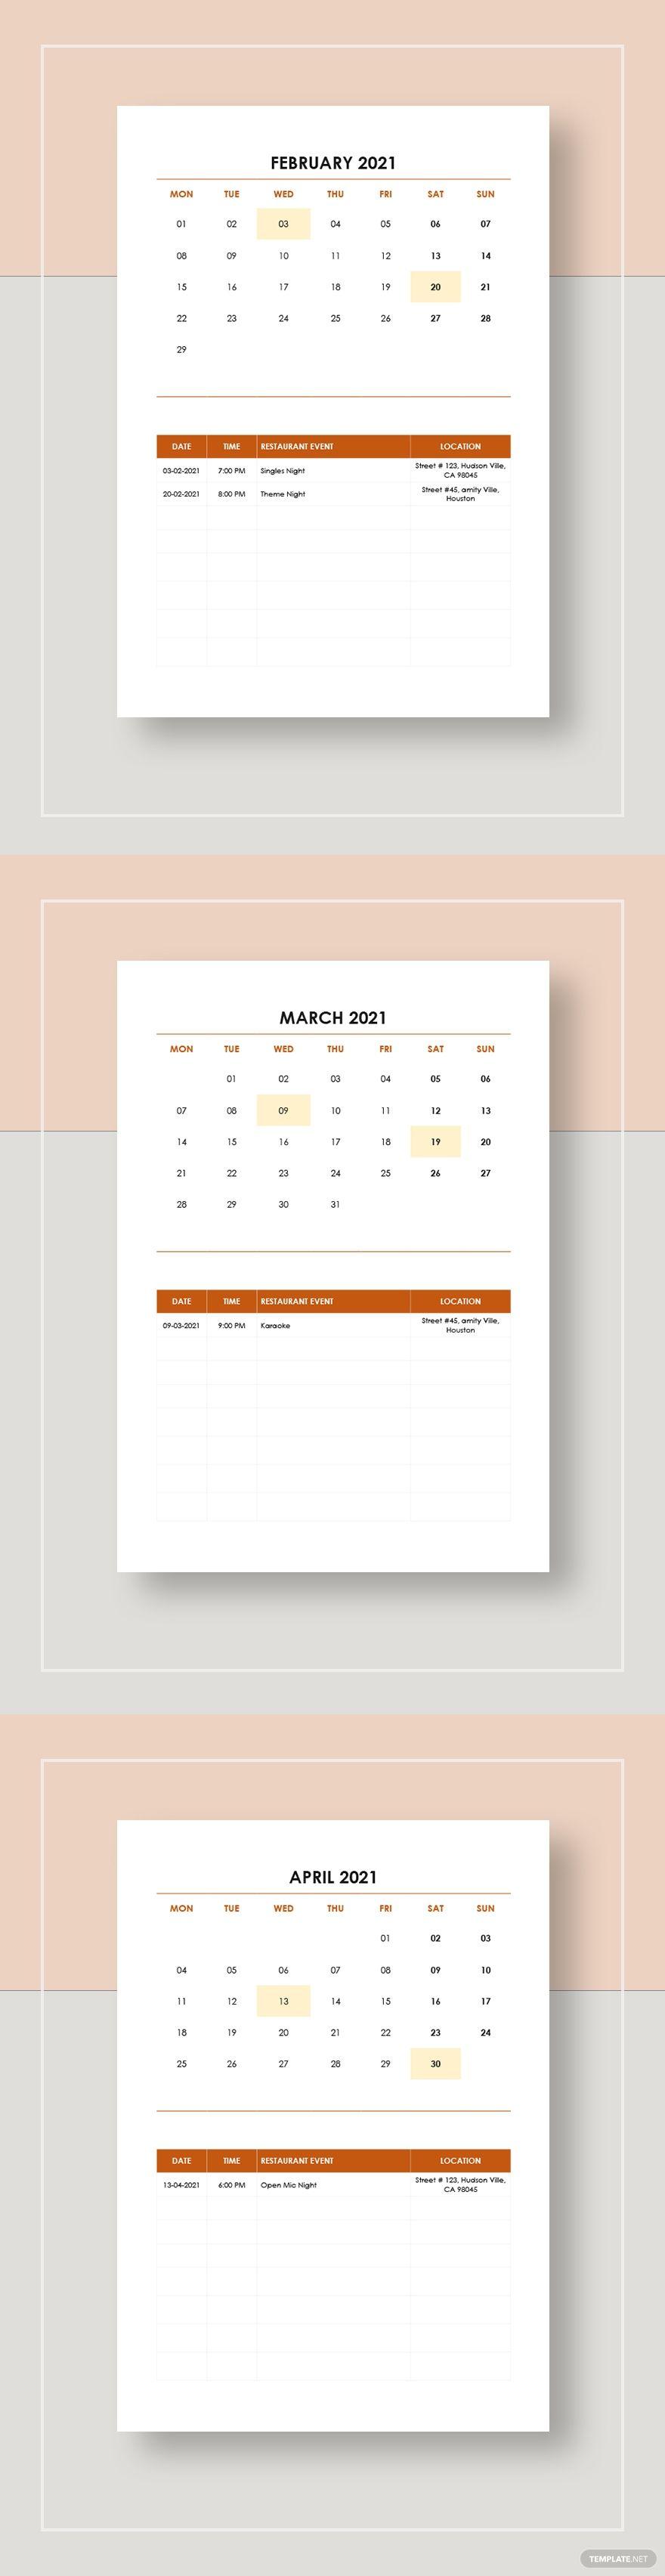 Restaurant Event Calendar Template Free Pdf Google Docs Word Apple Pages Template Net Event Calendar Template Calendar Template Website Template Event calendar template for website